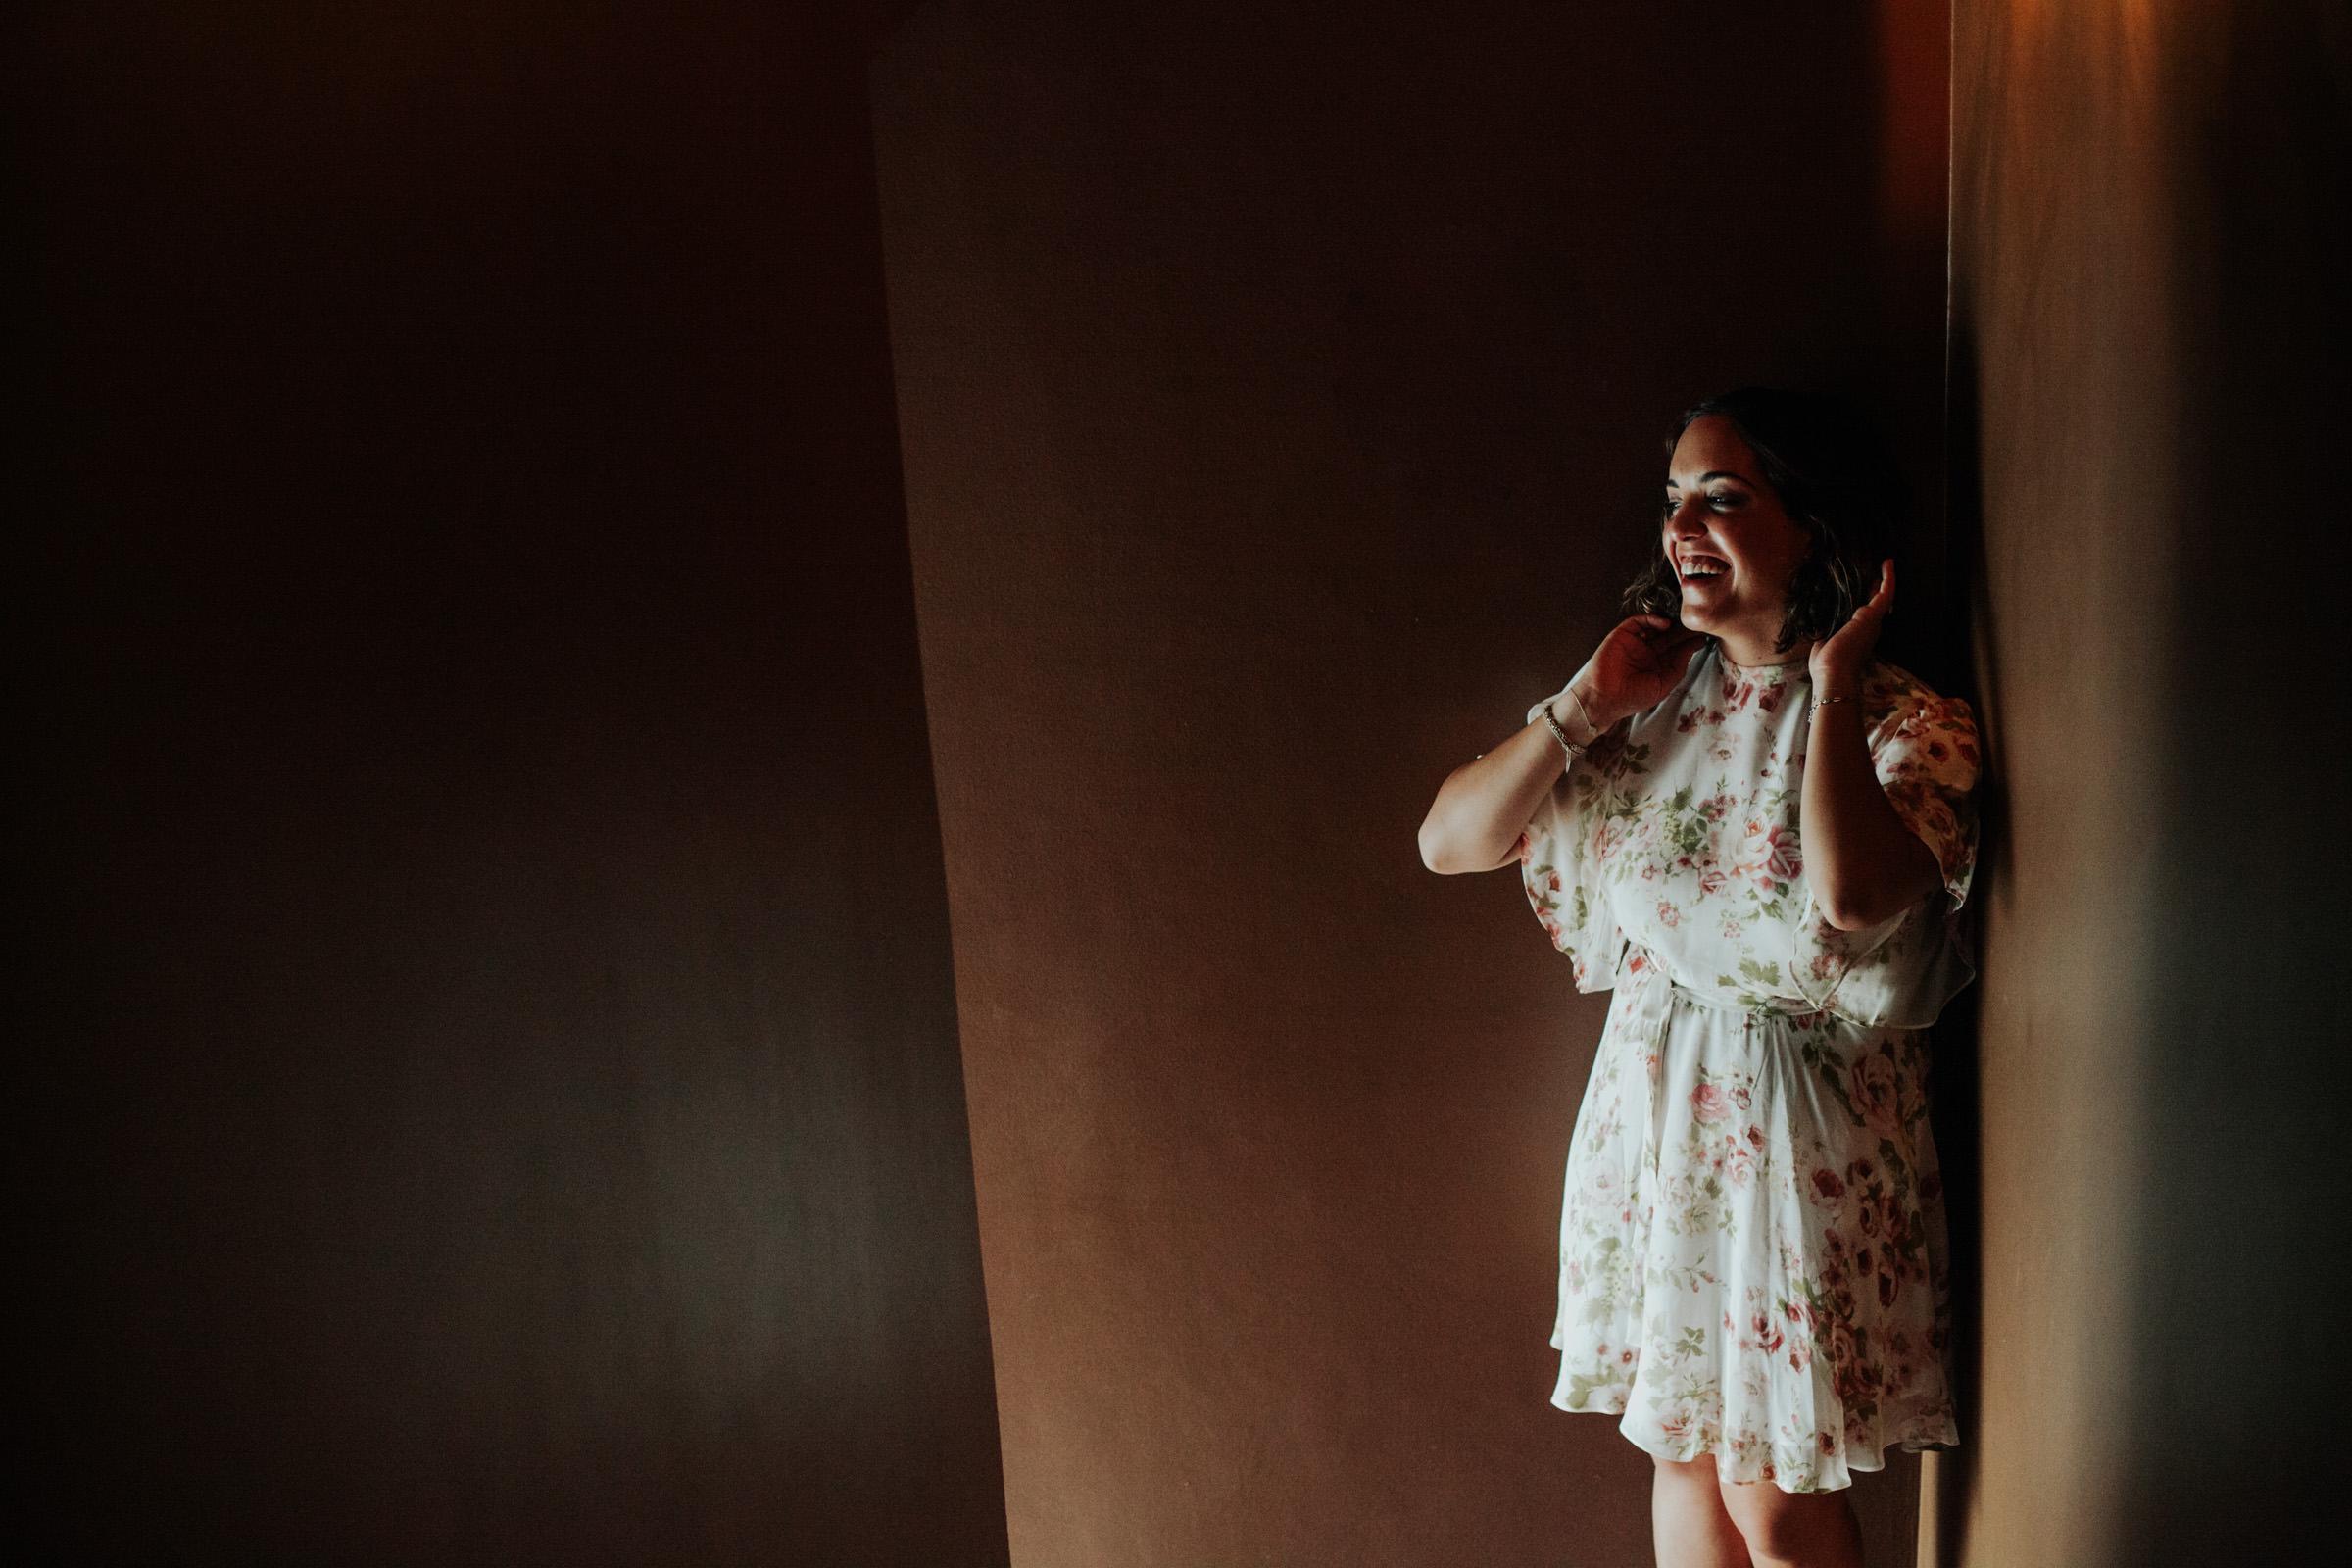 Fotografo-Boda-Hotel-Condesa-DF-Mexico-CDMX-Photography-Wedding-Pierce-38.jpg